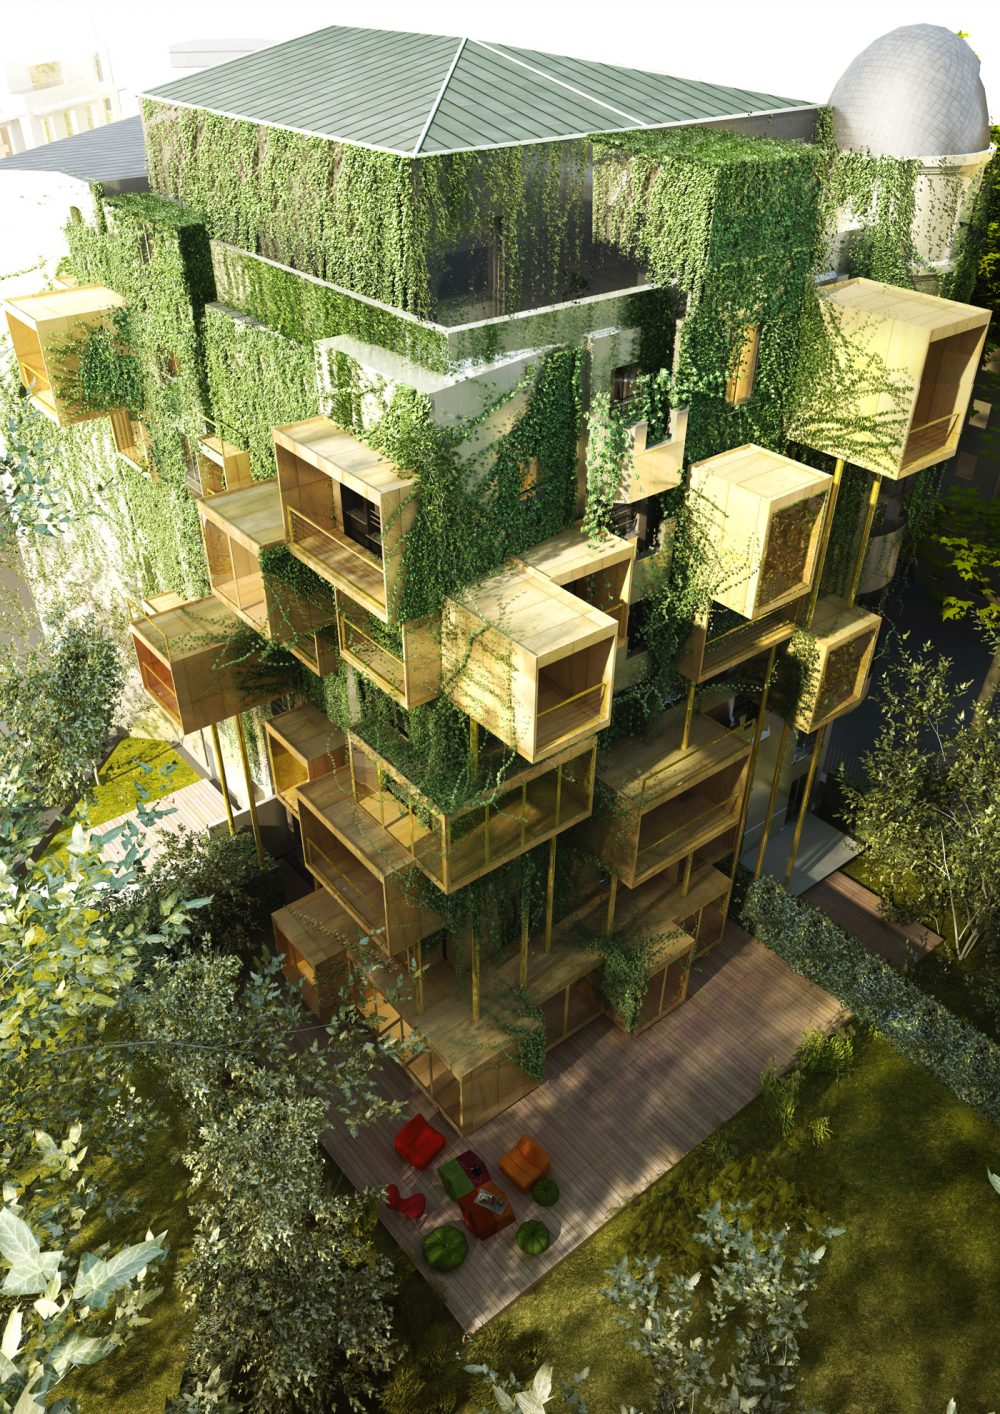 Une architecture du futur for Architecture du futur